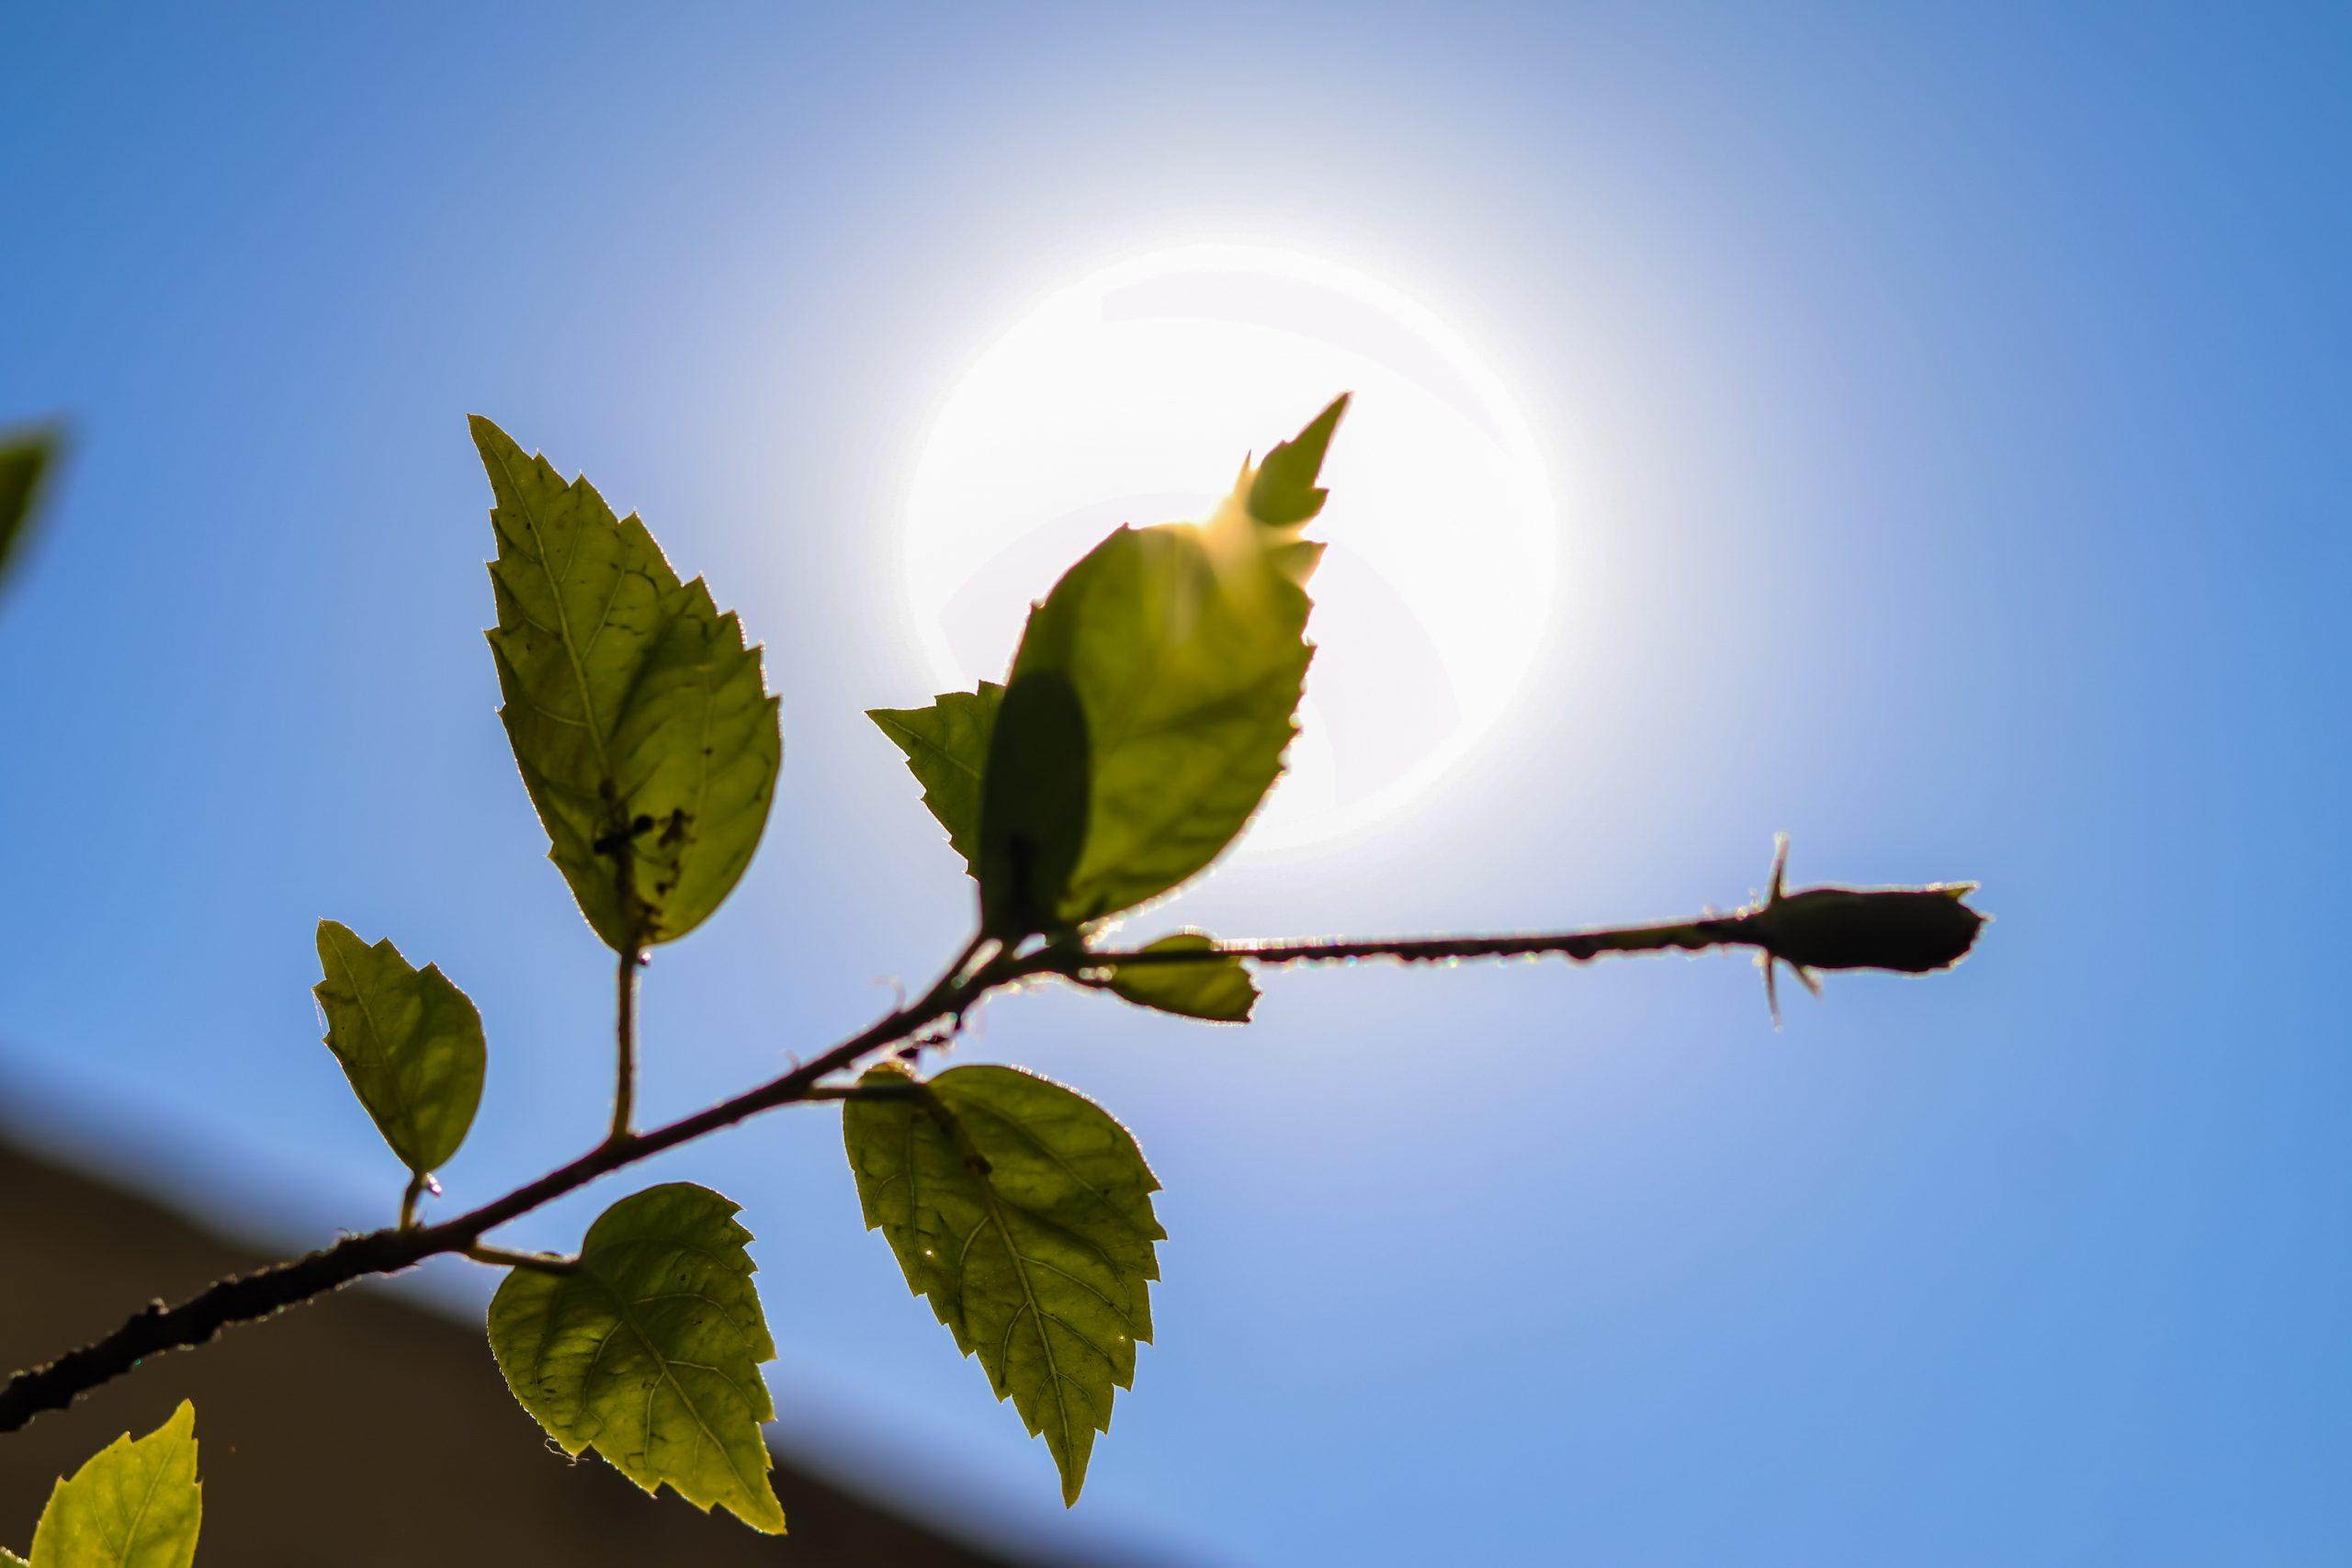 Plant under sunshine